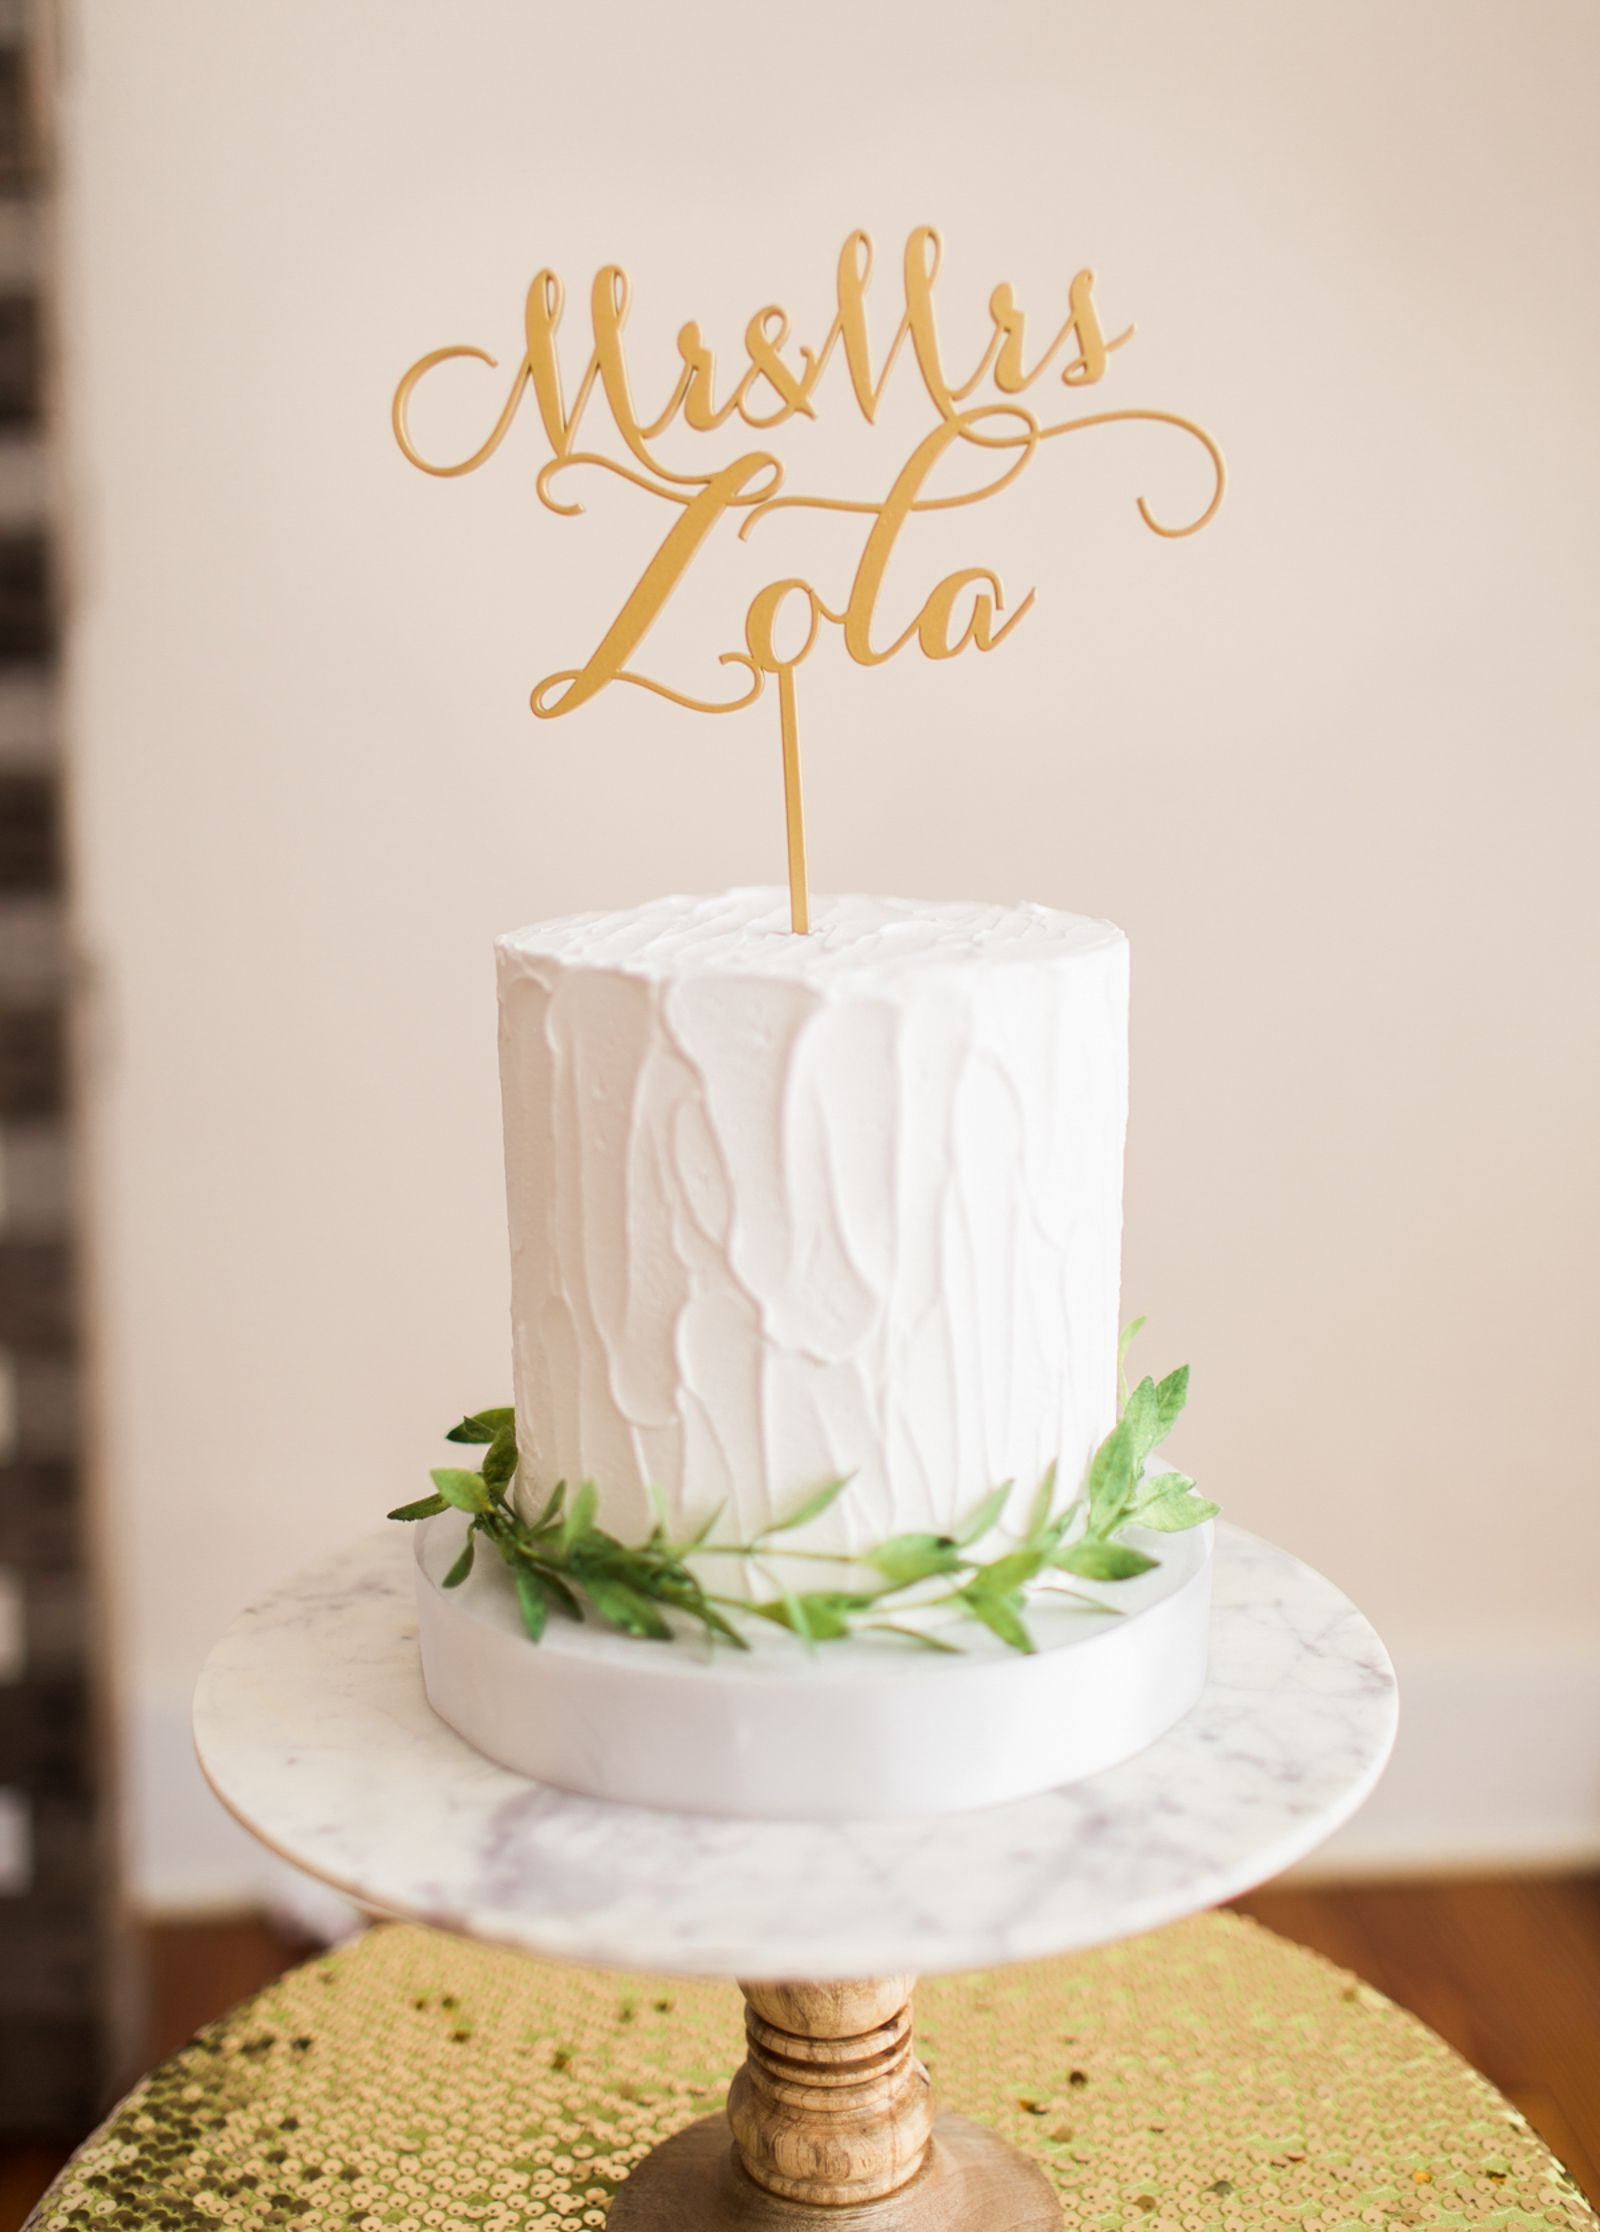 Personalized wedding cake topper handmade wedding wedding cake